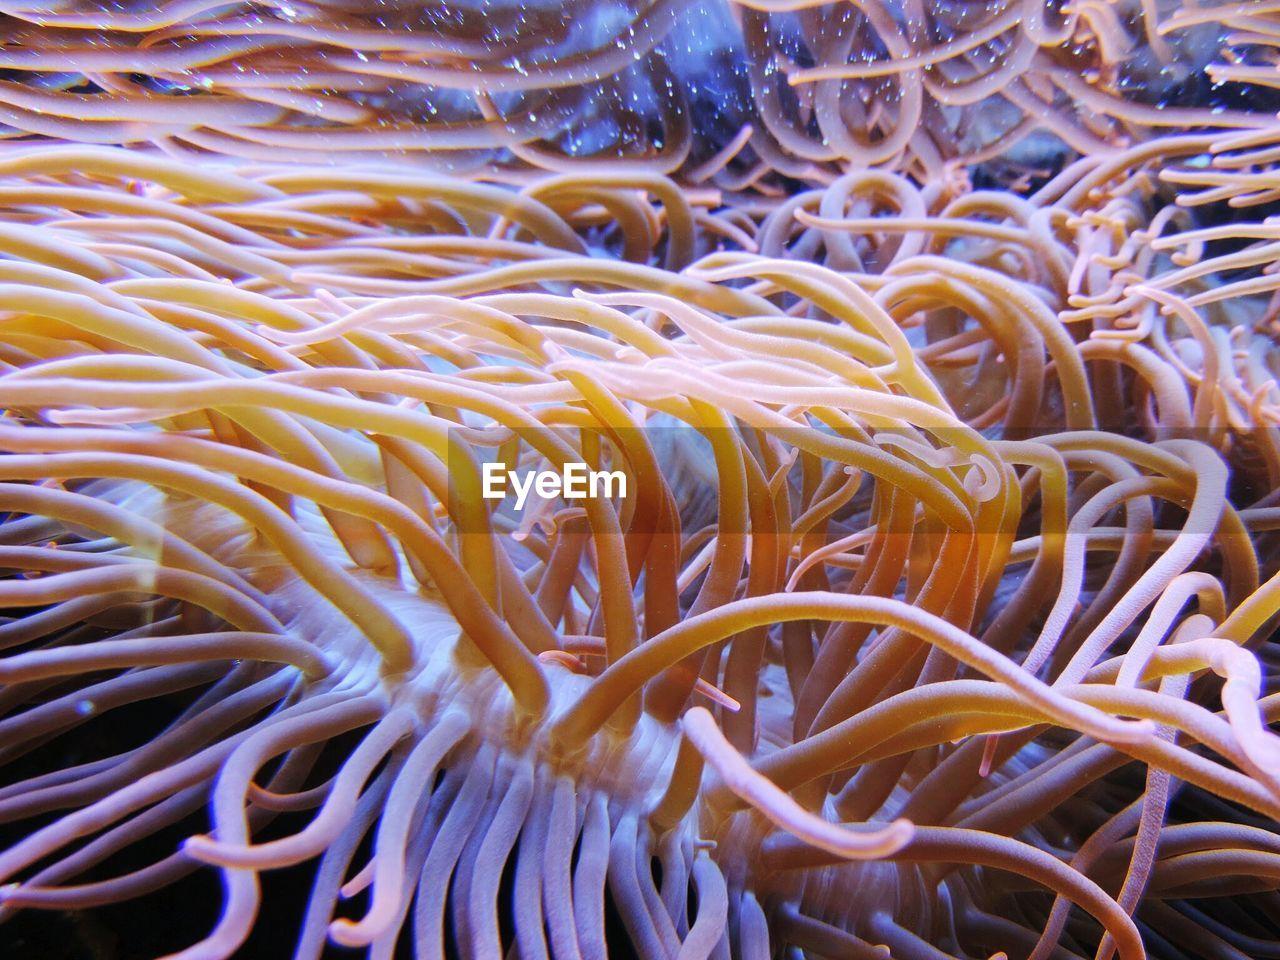 Close-Up Of Reef Underwater